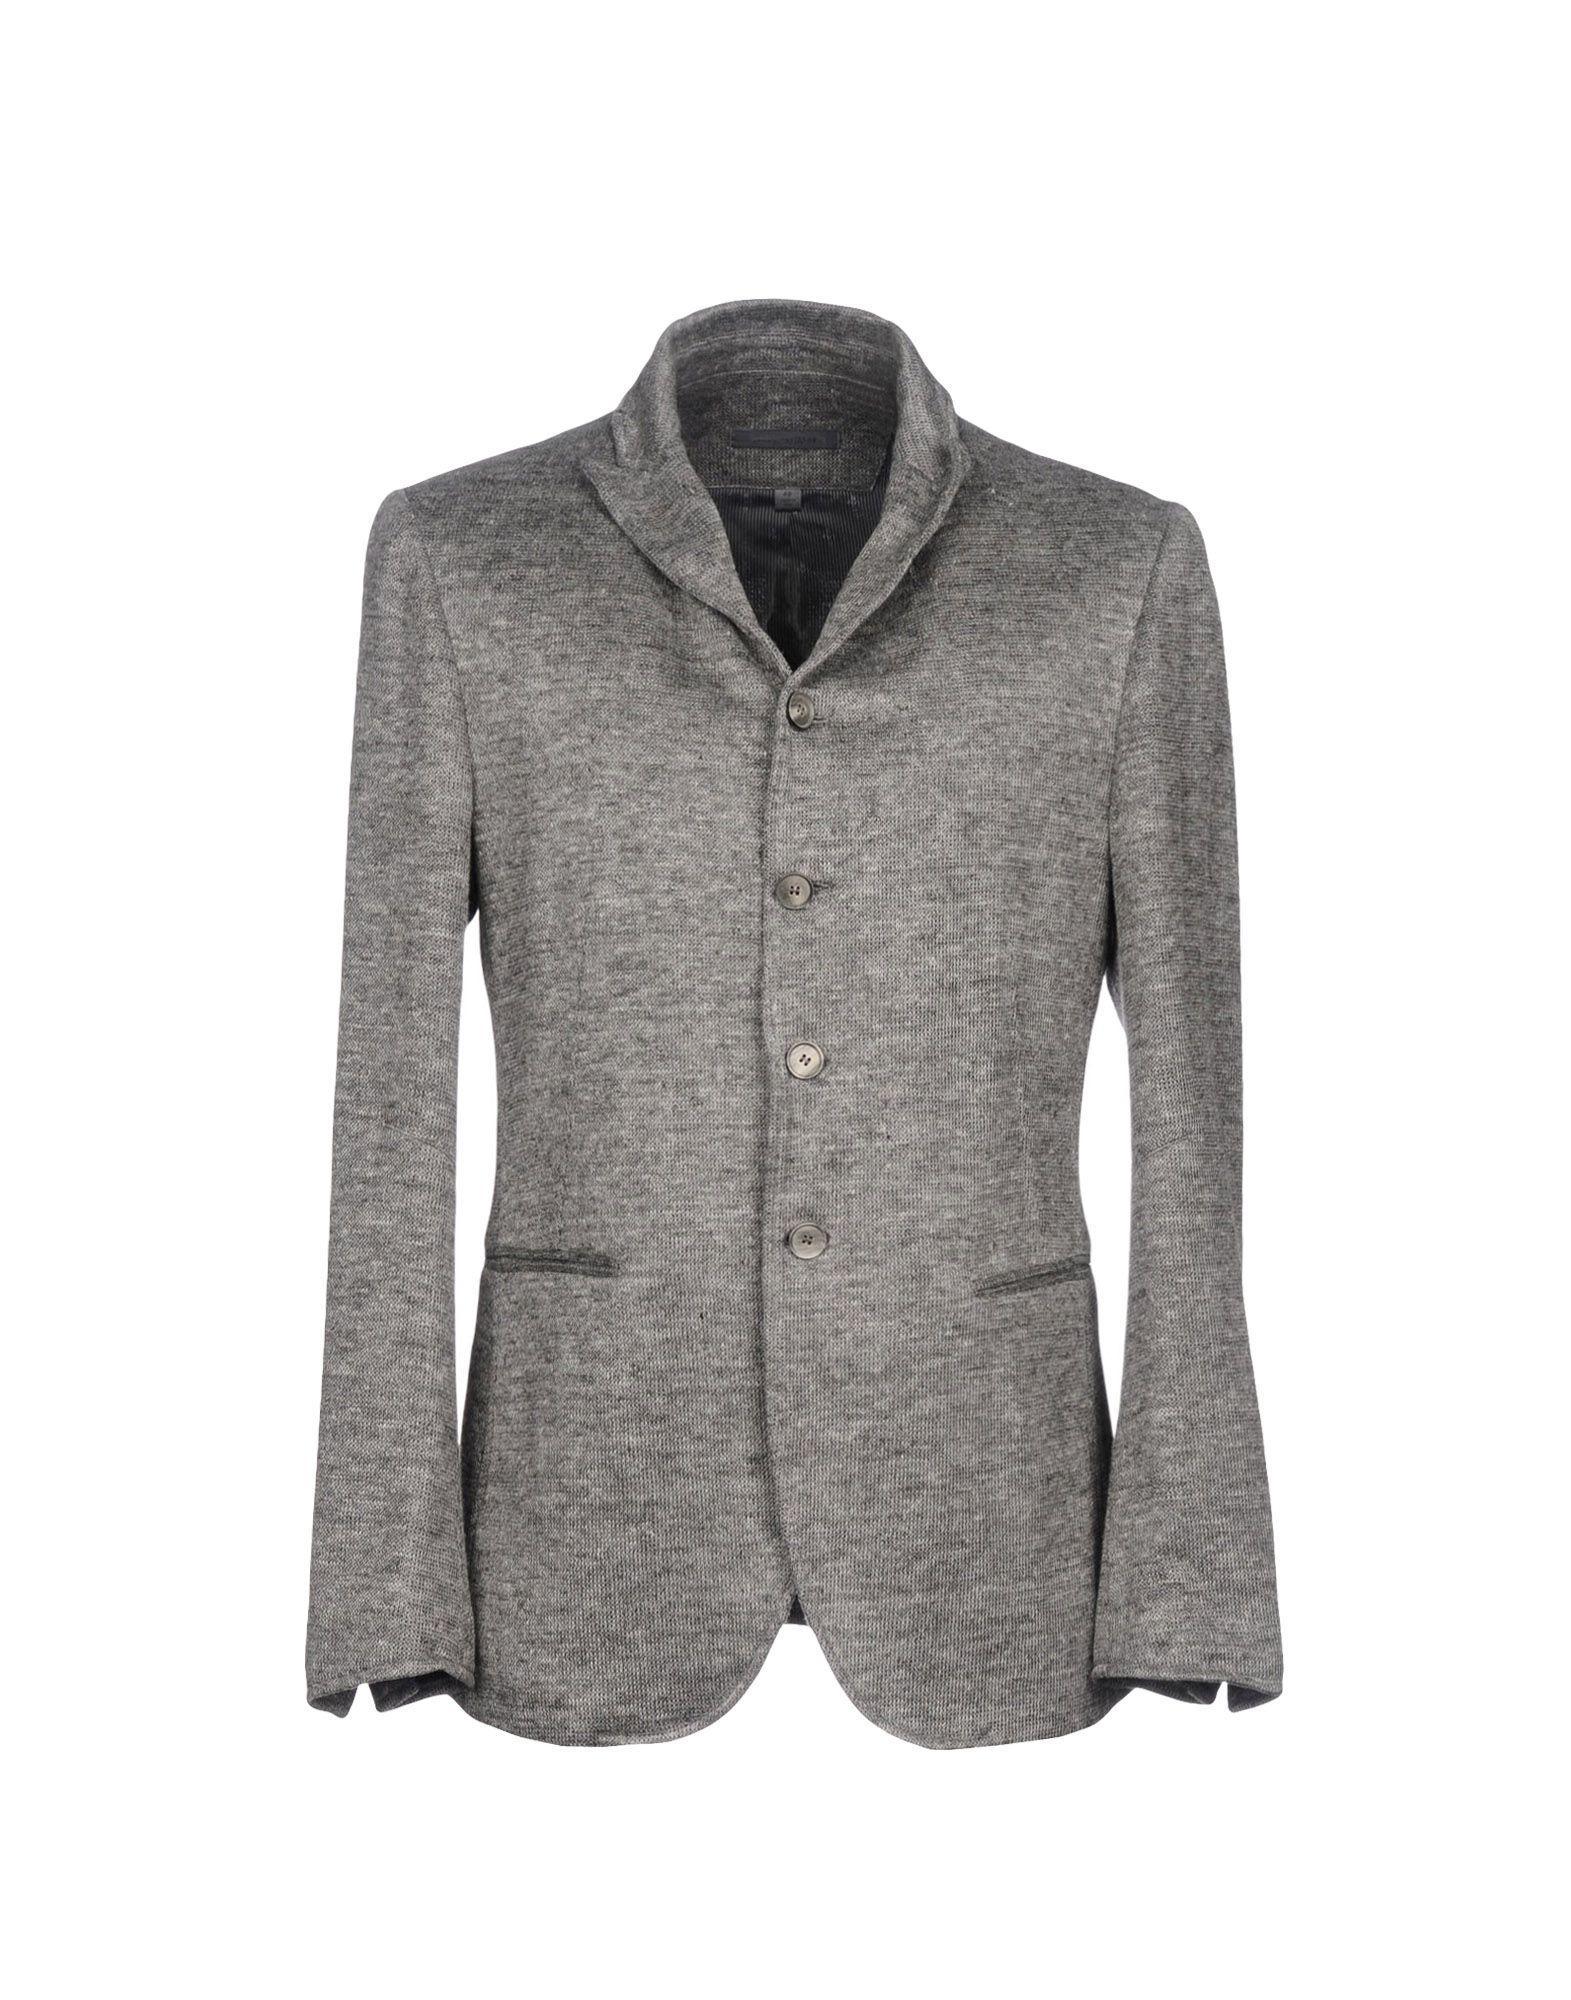 John Varvatos Blazer In Grey